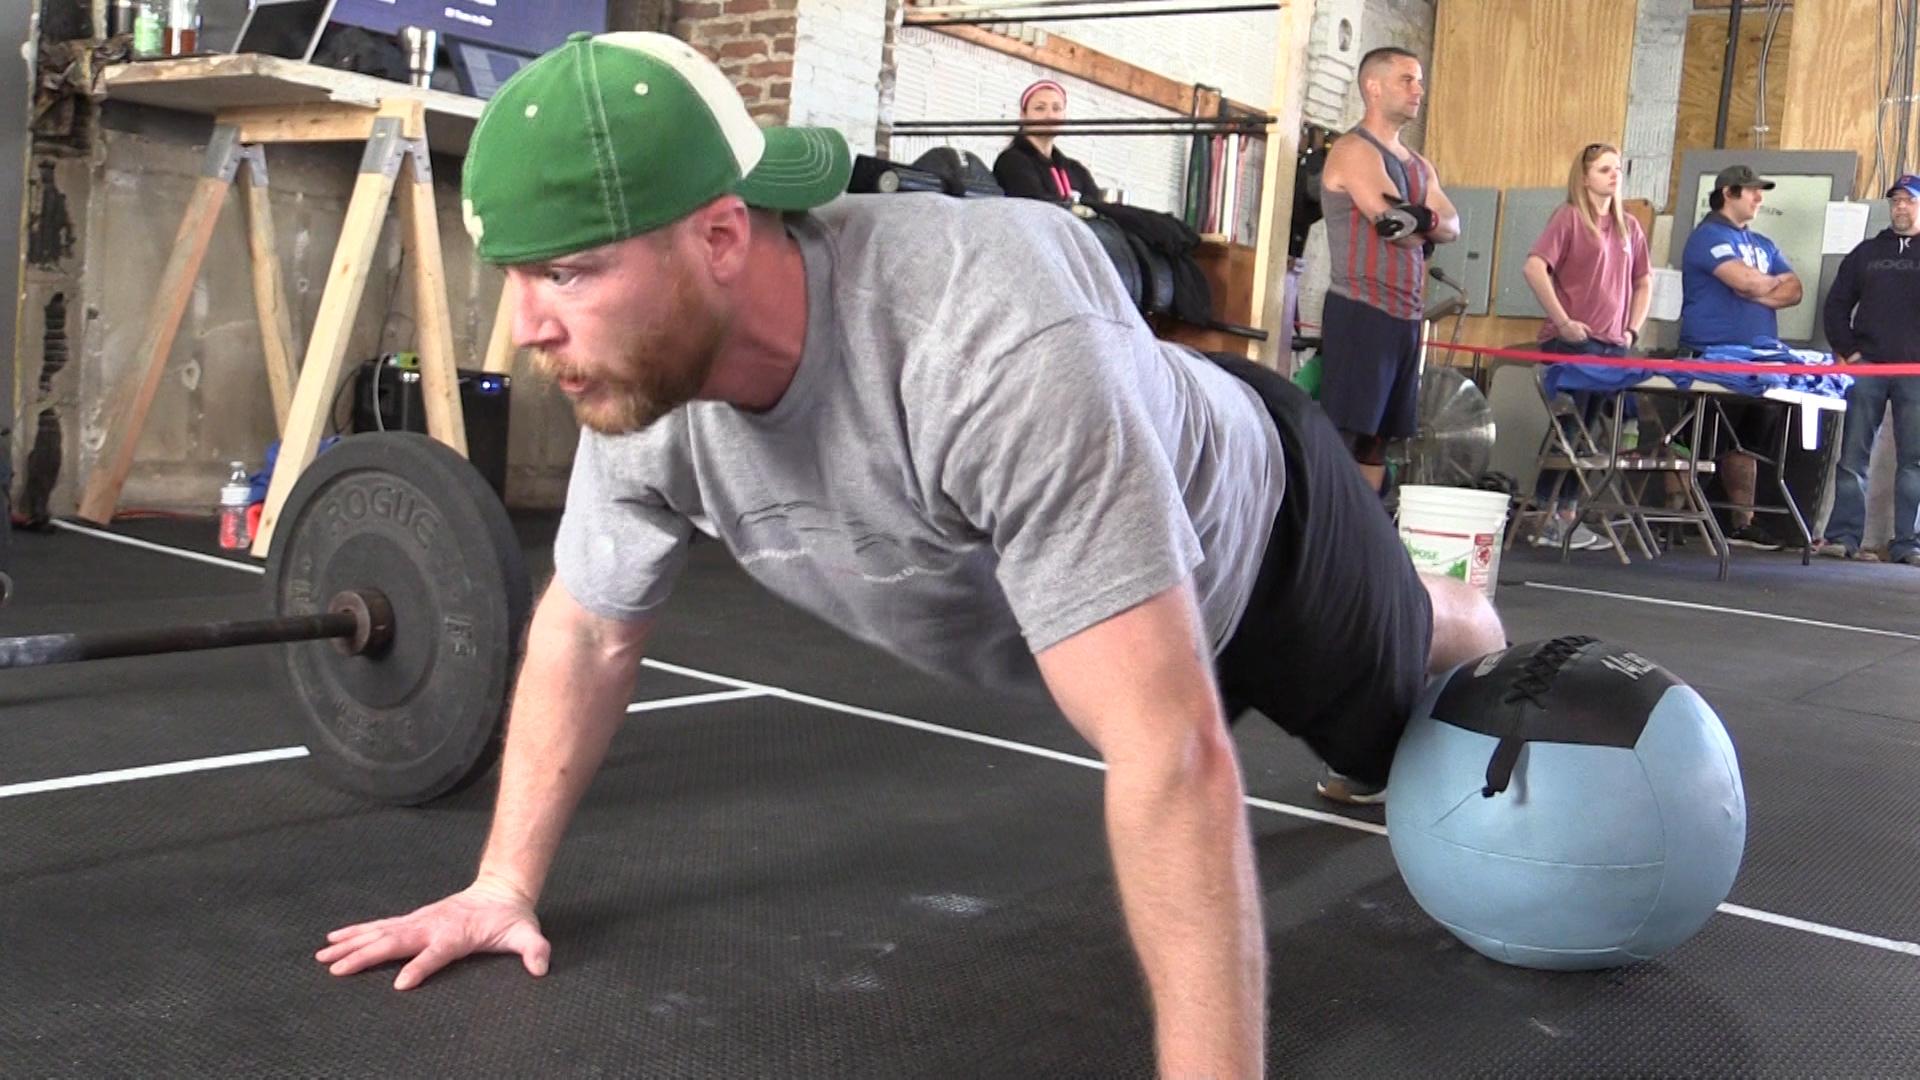 VIDEO - CrossFit to prevent veteran suicide